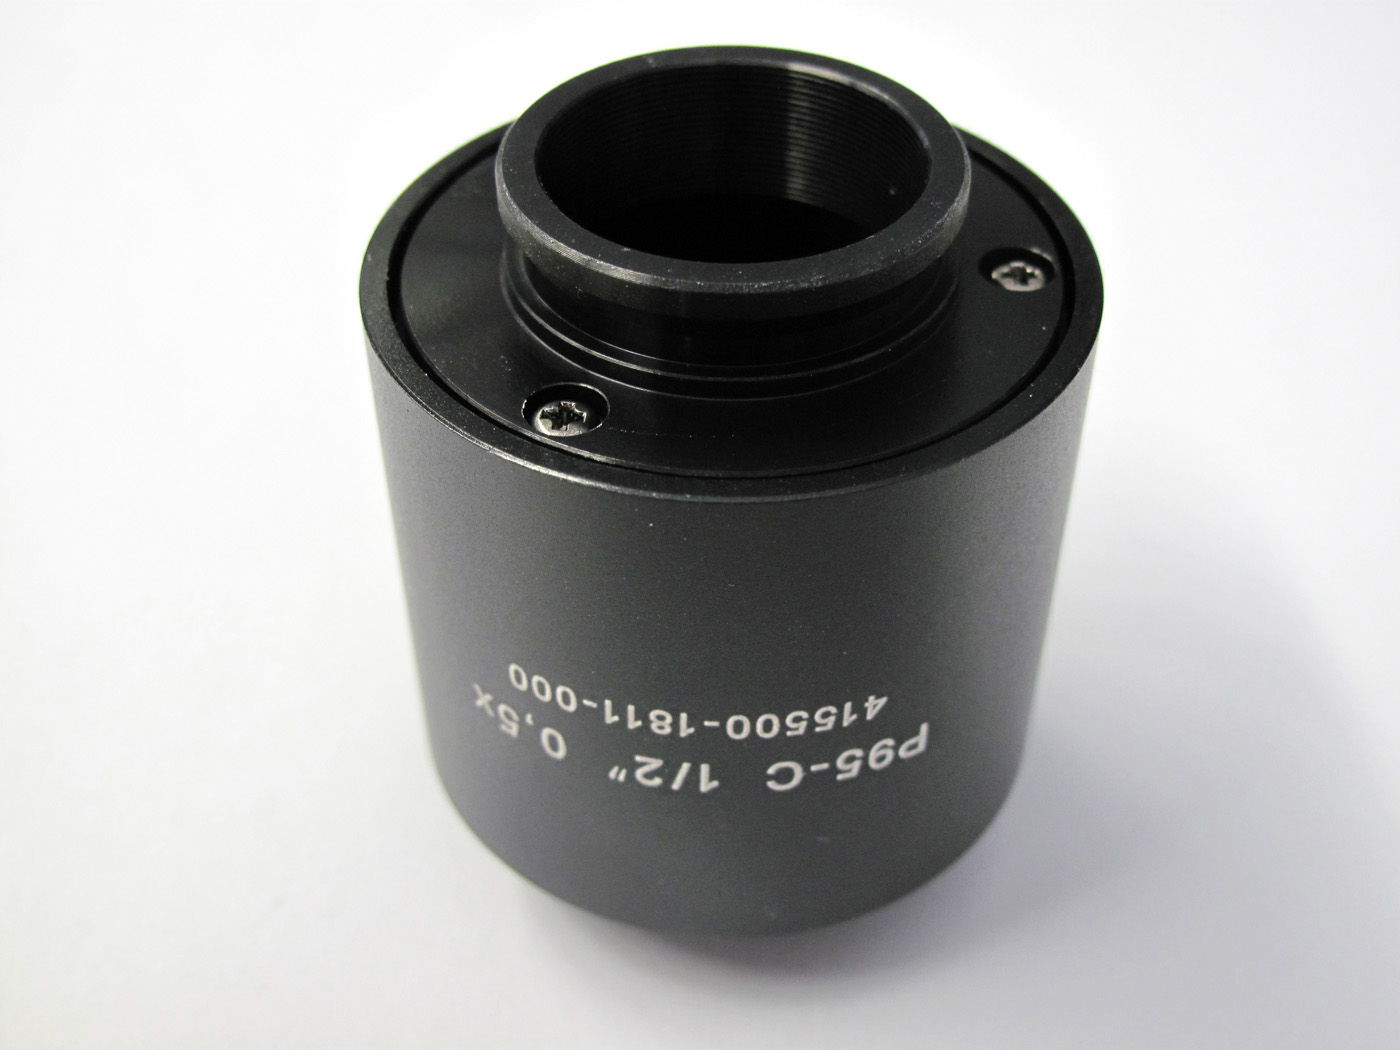 Kamera adapter p c für primo star vert mikroskope